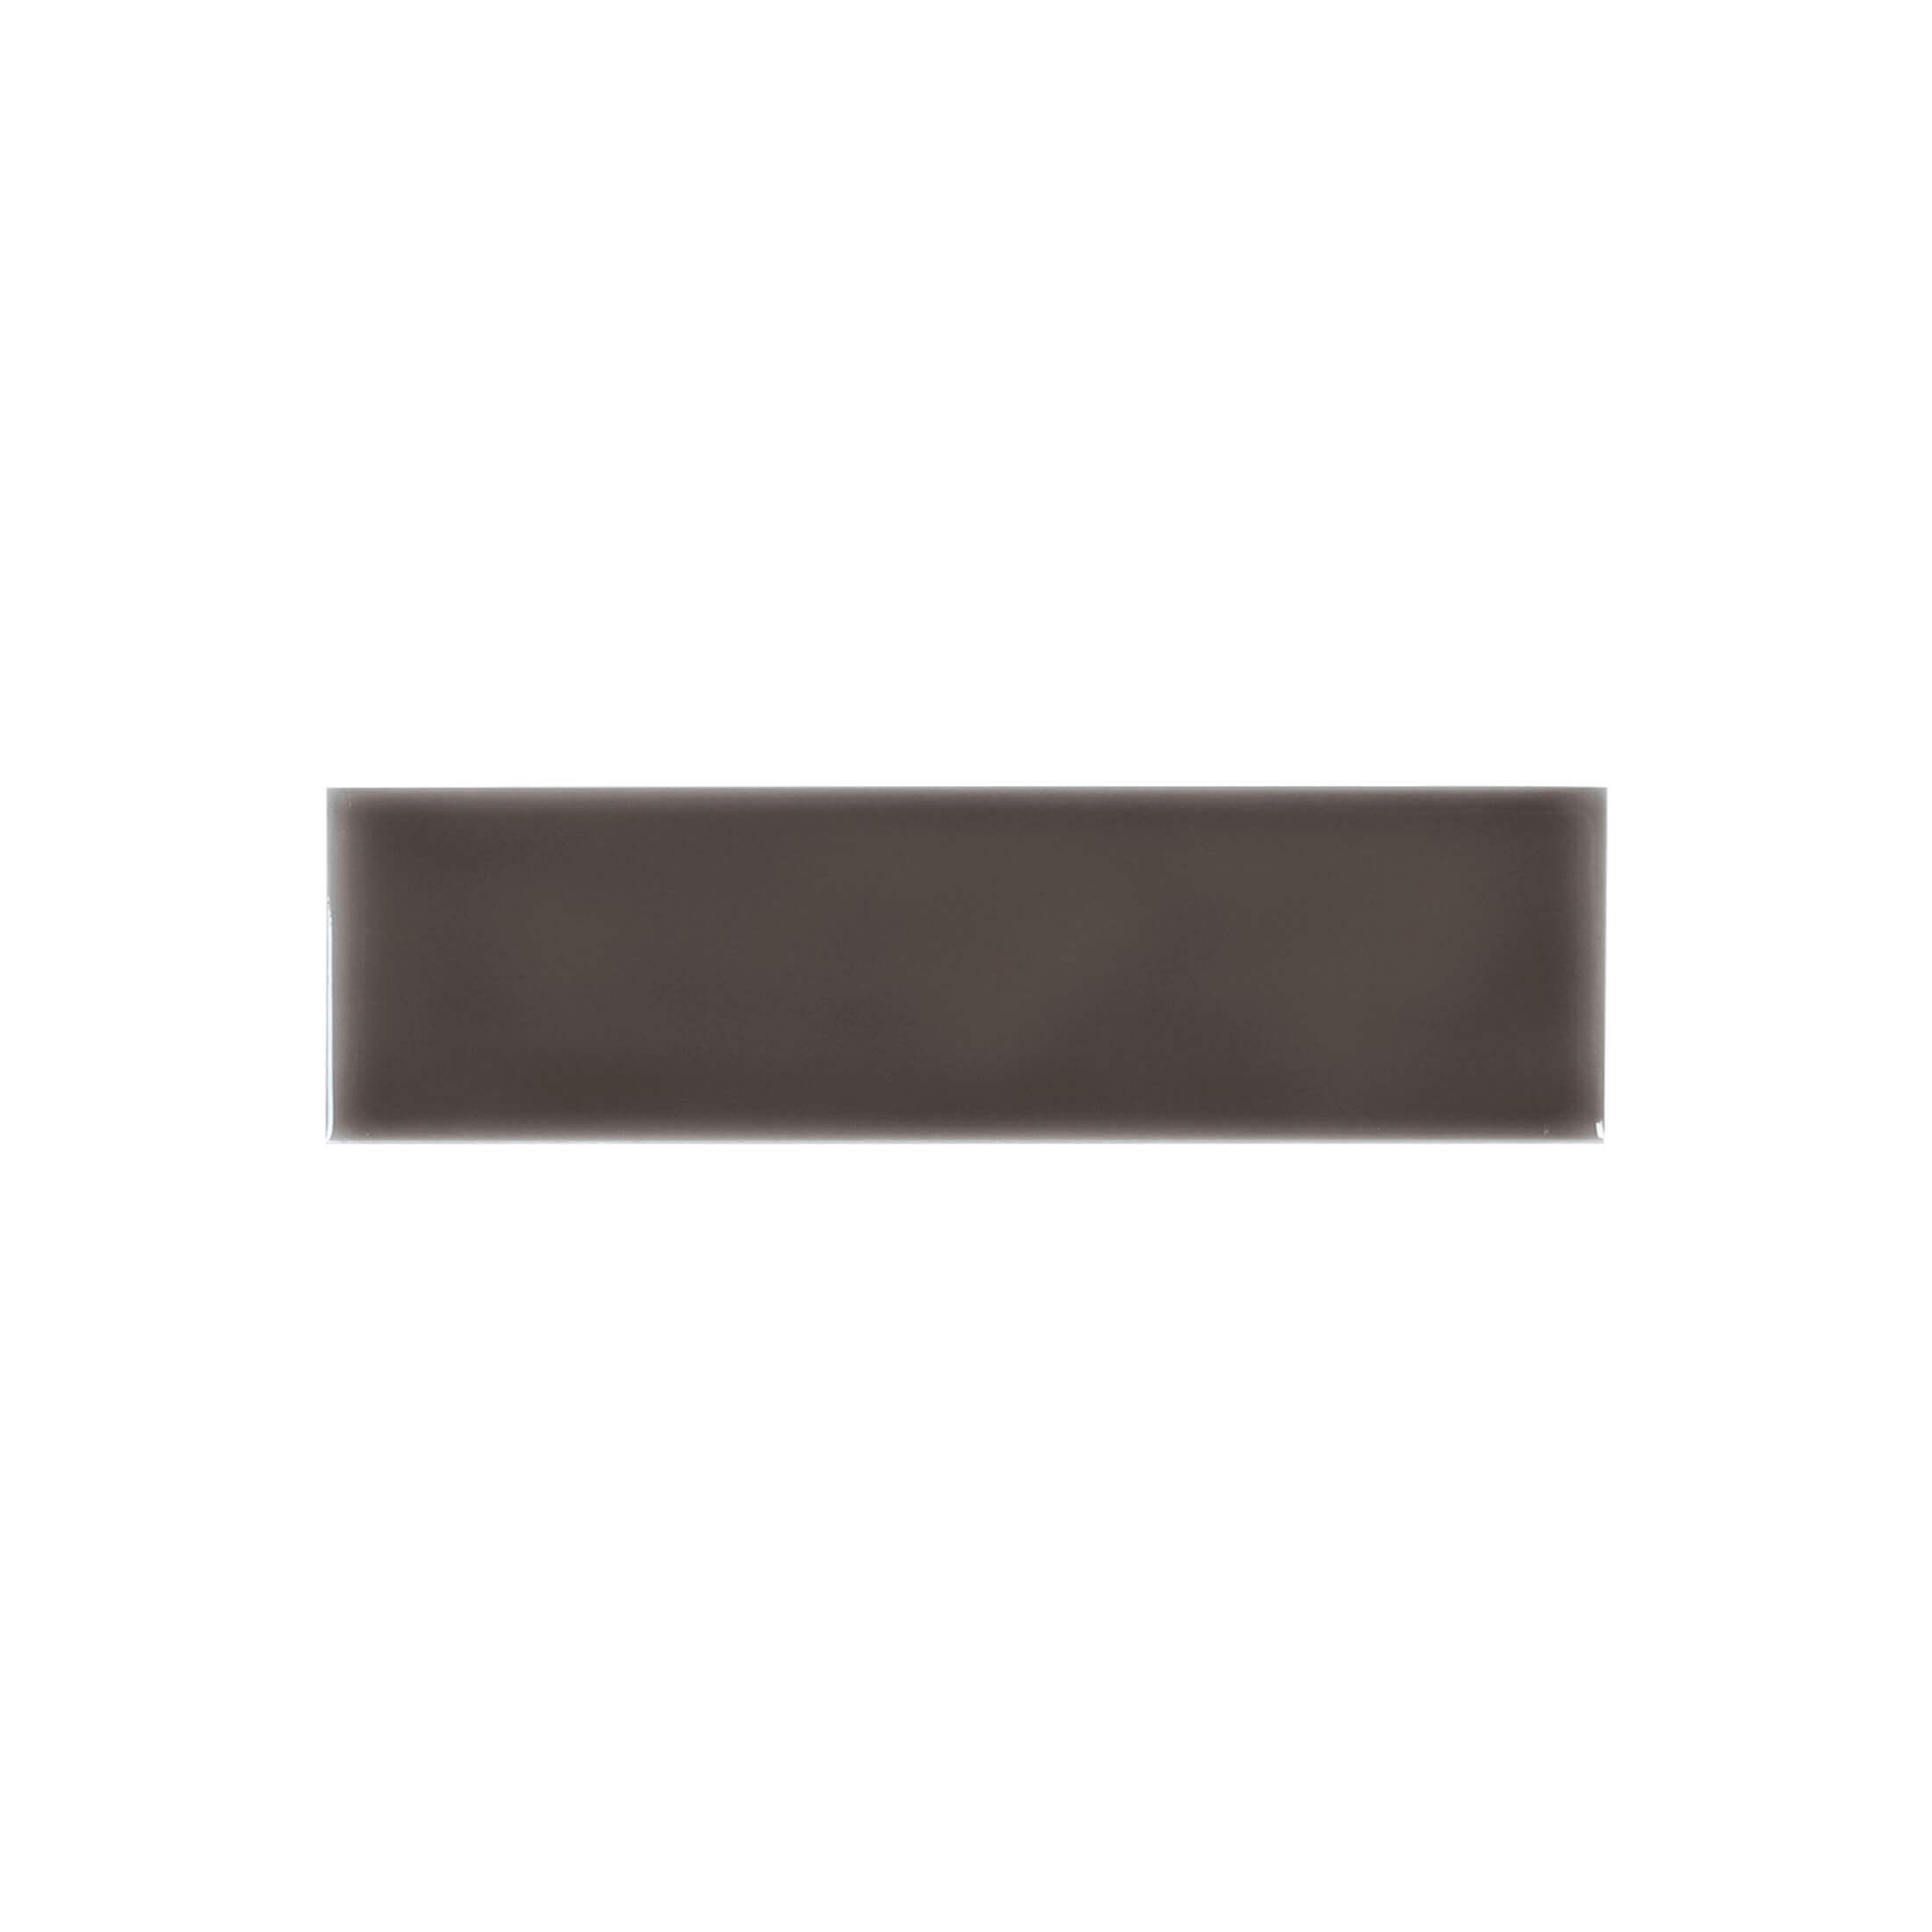 ADST1039 - LISO  - 4.9 cm X 19.8 cm